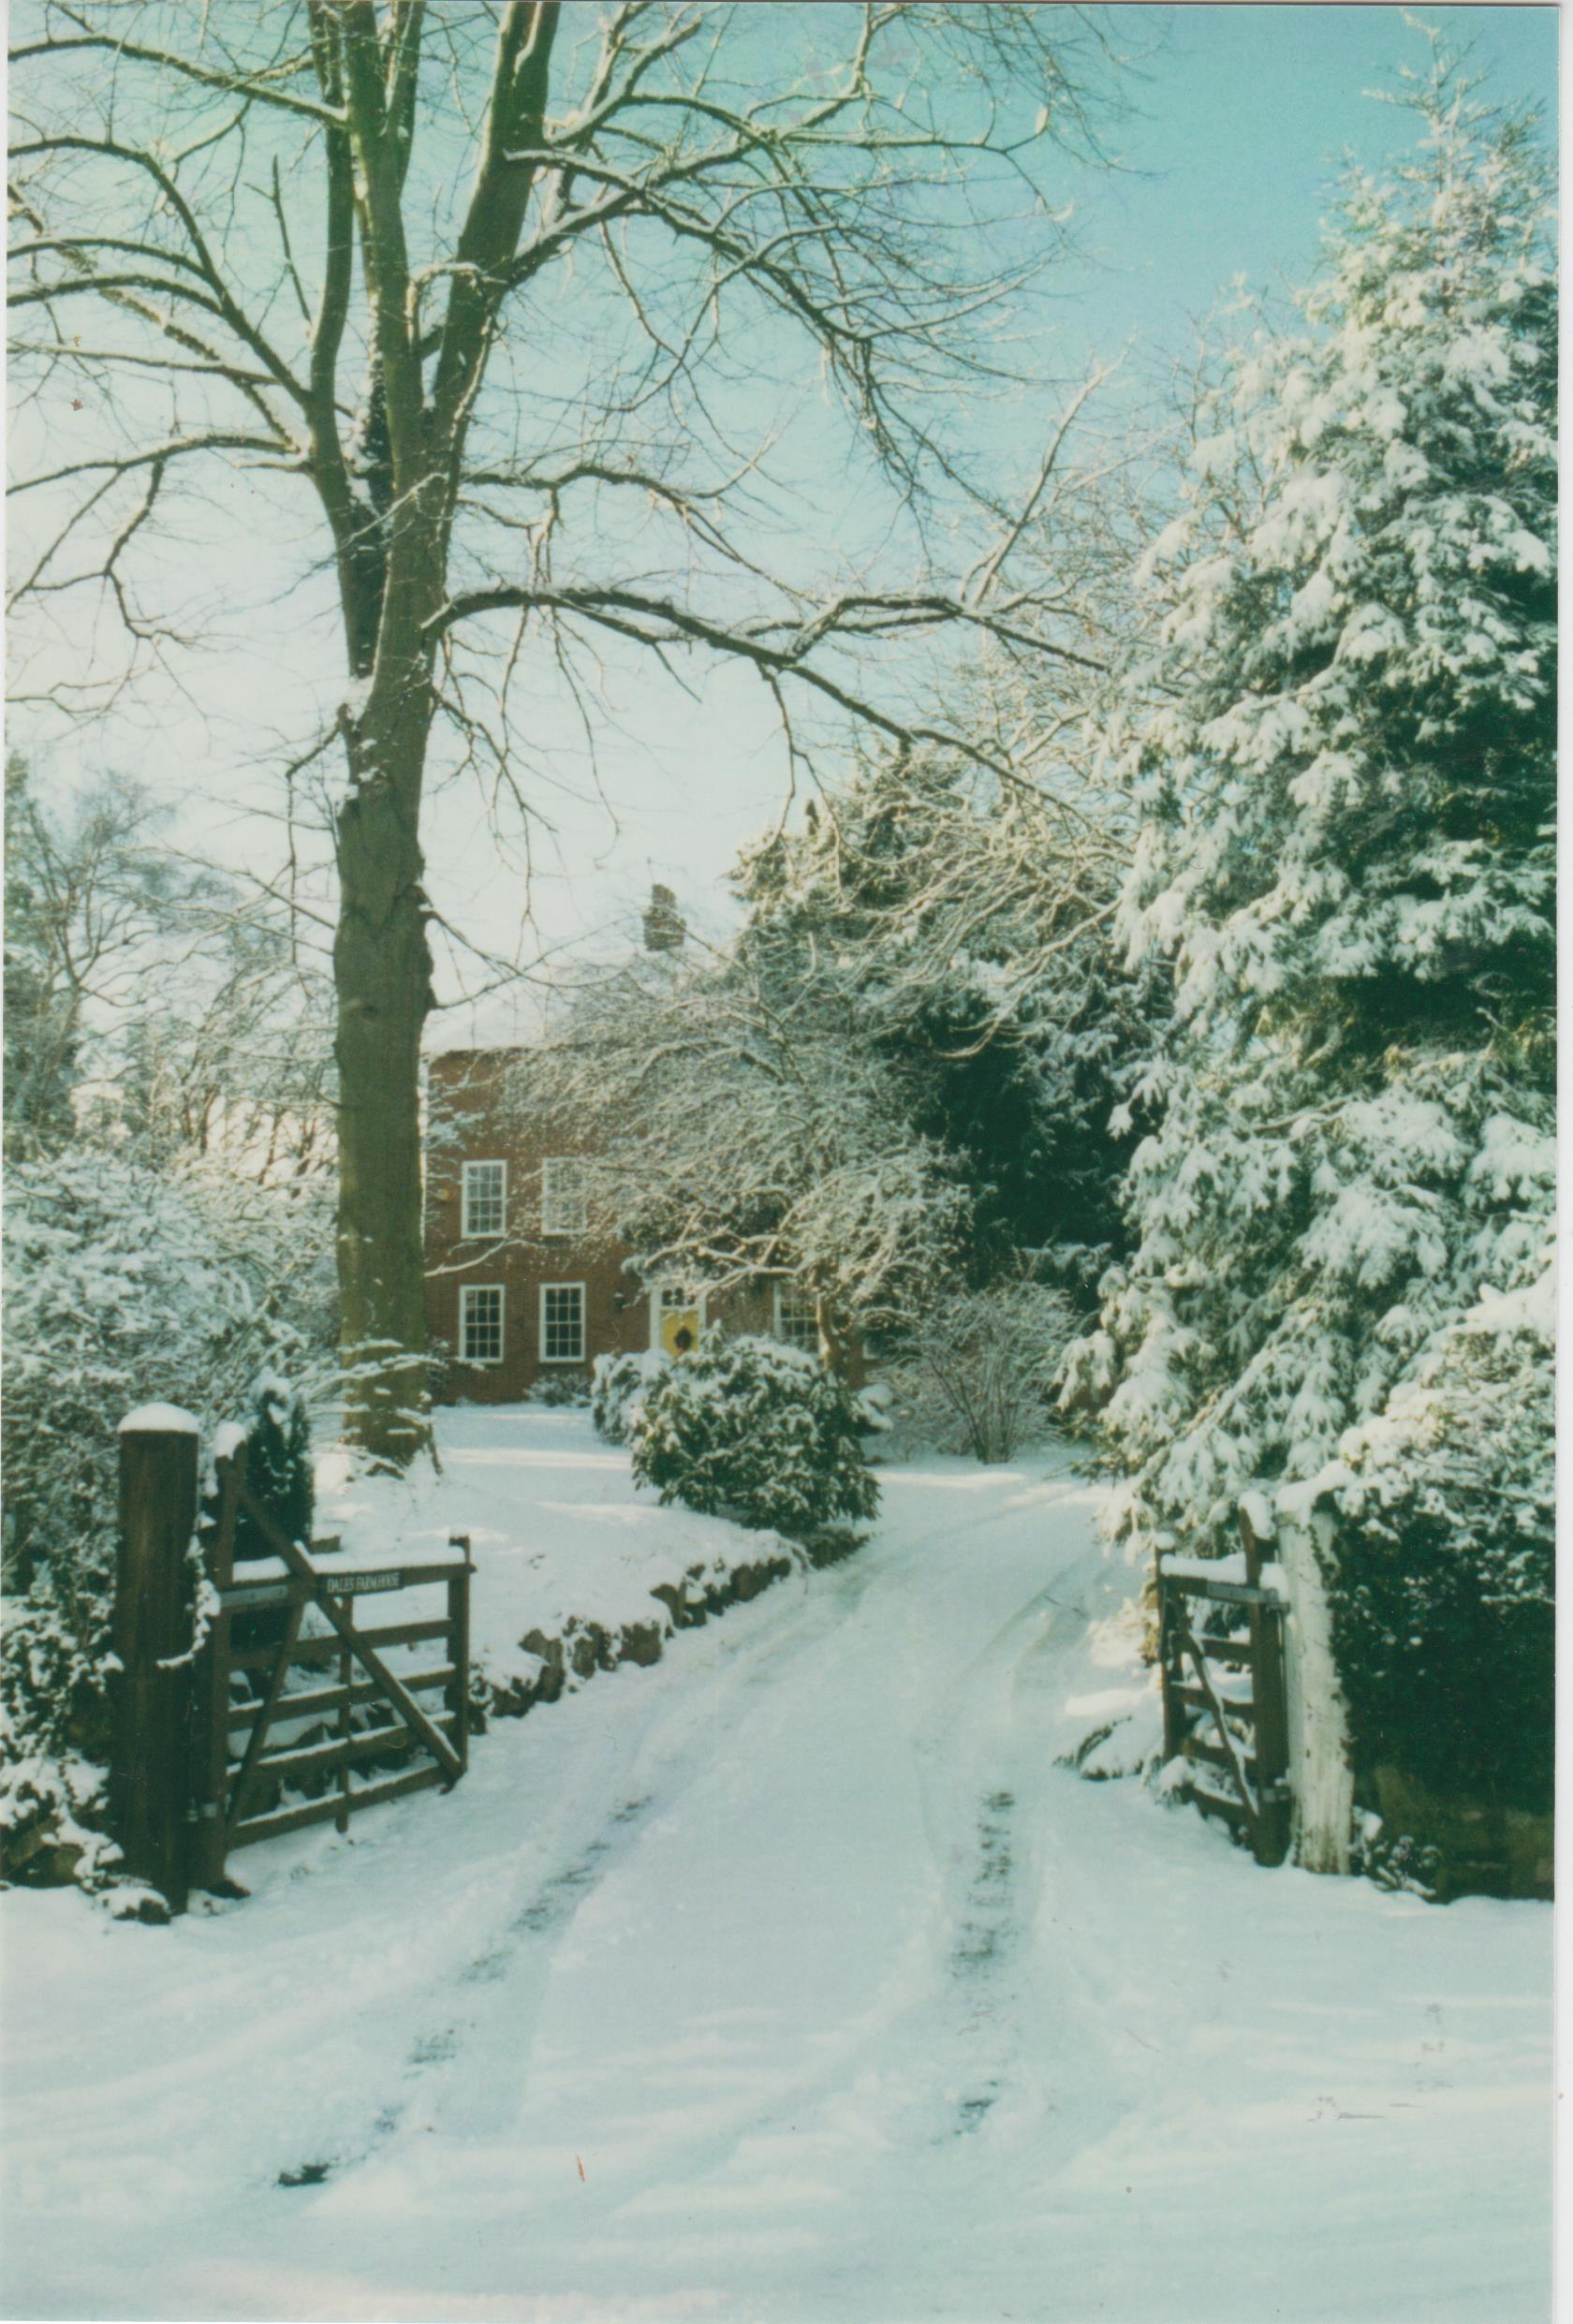 dale-farm-winter-scene-001.jpg